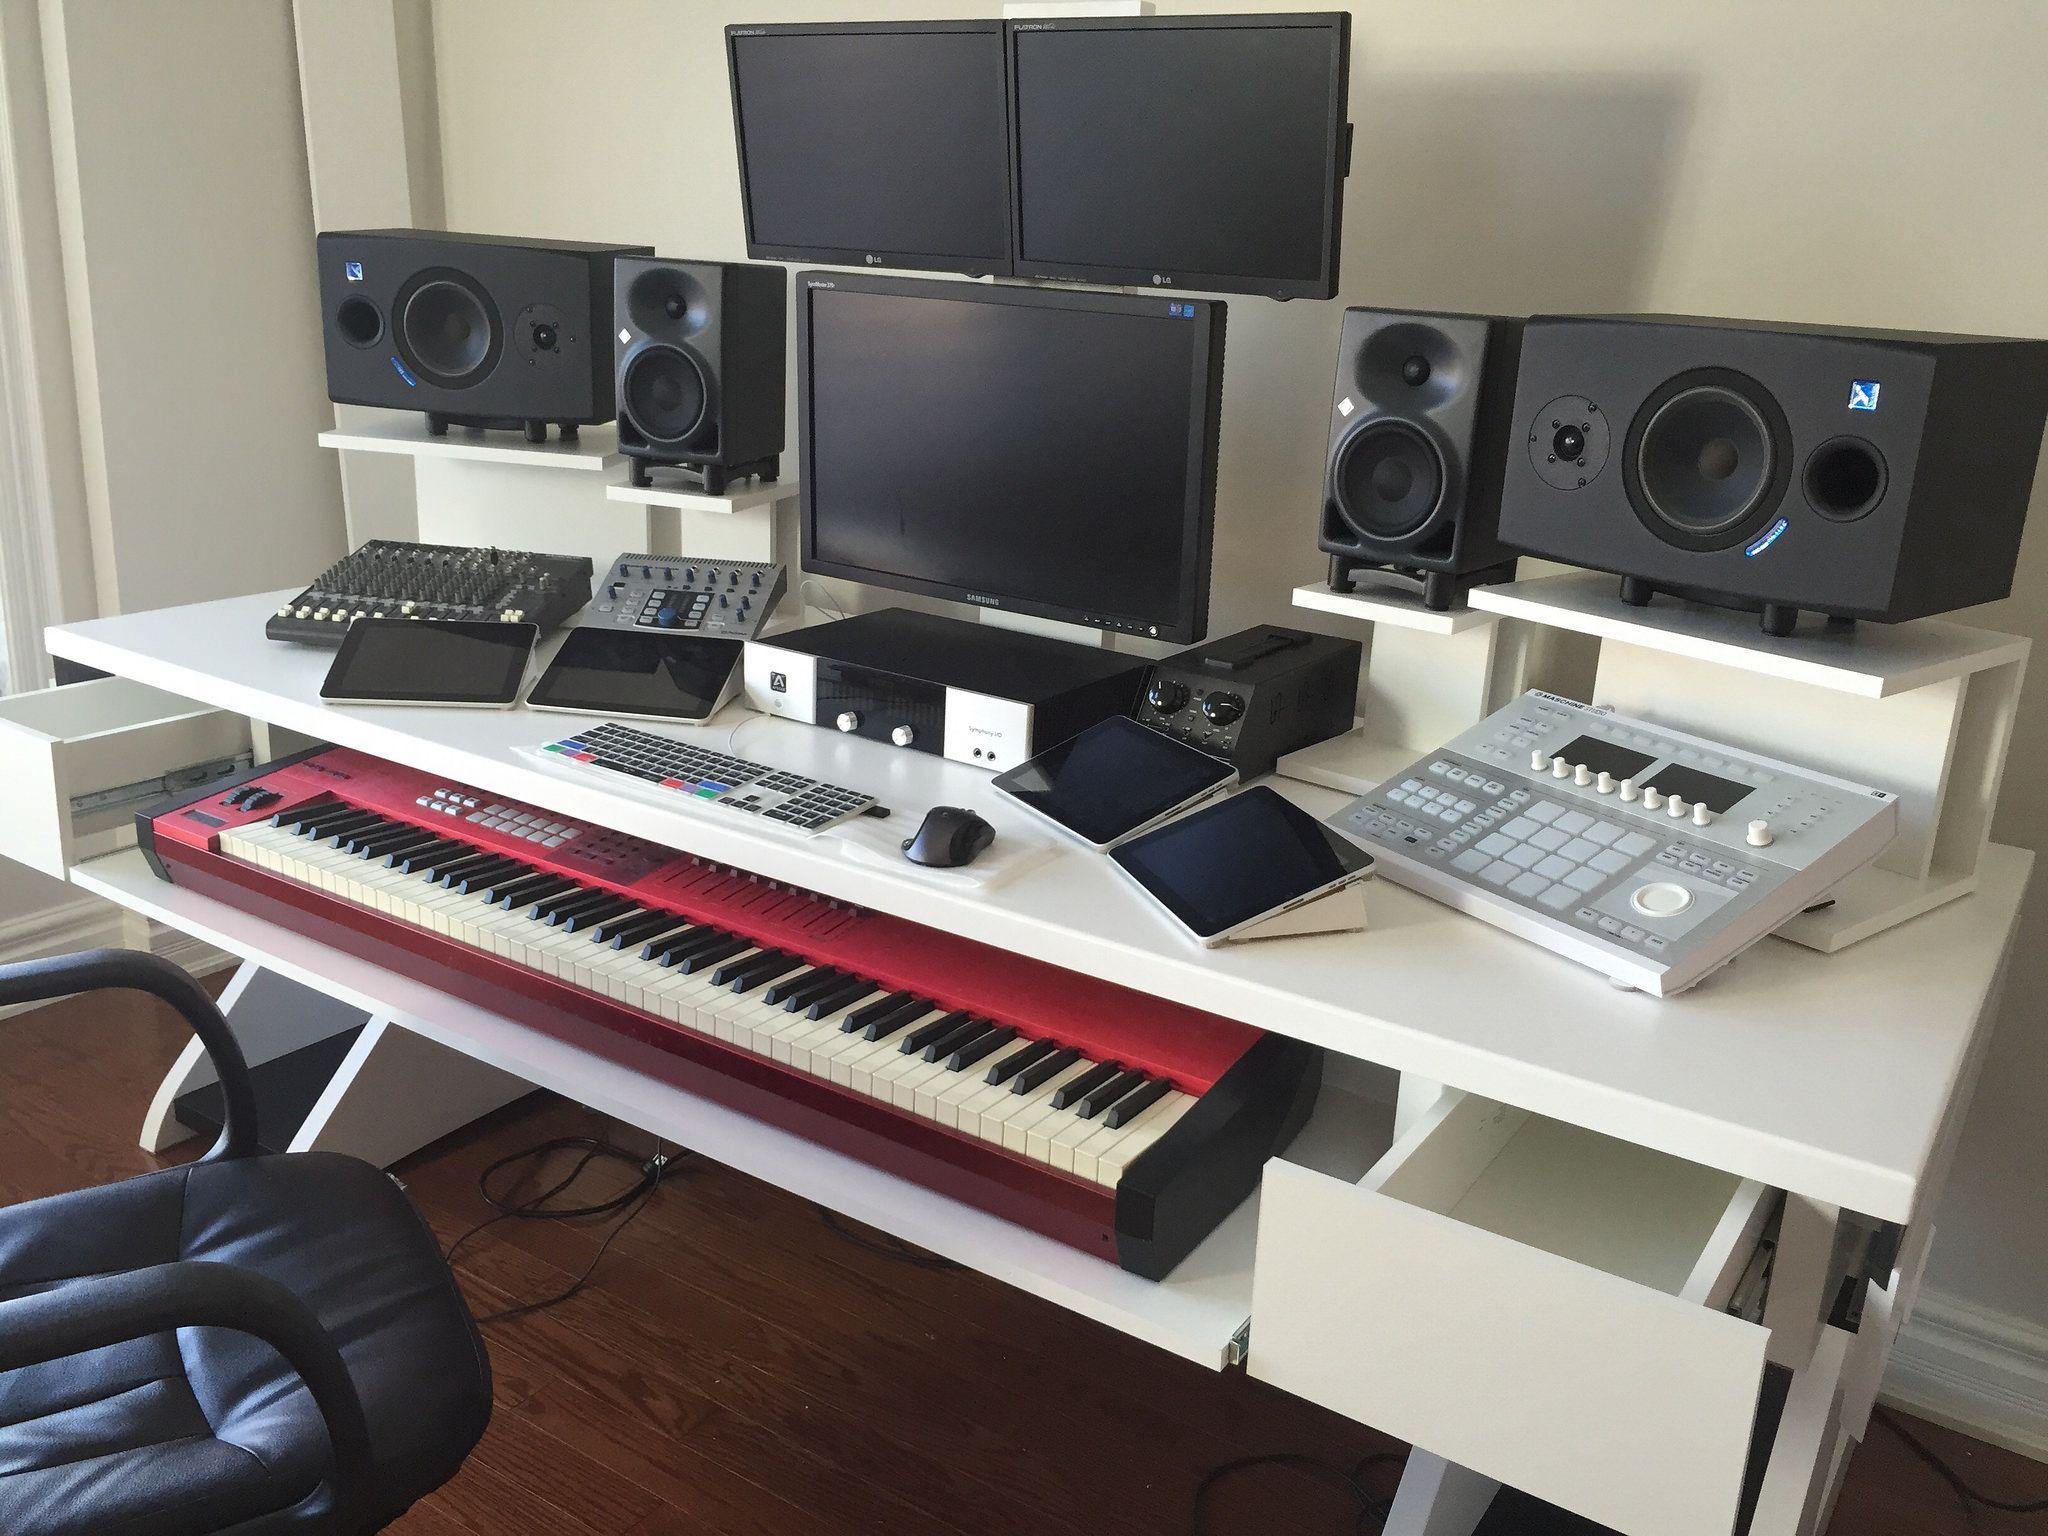 Pin on Studio Desk diy